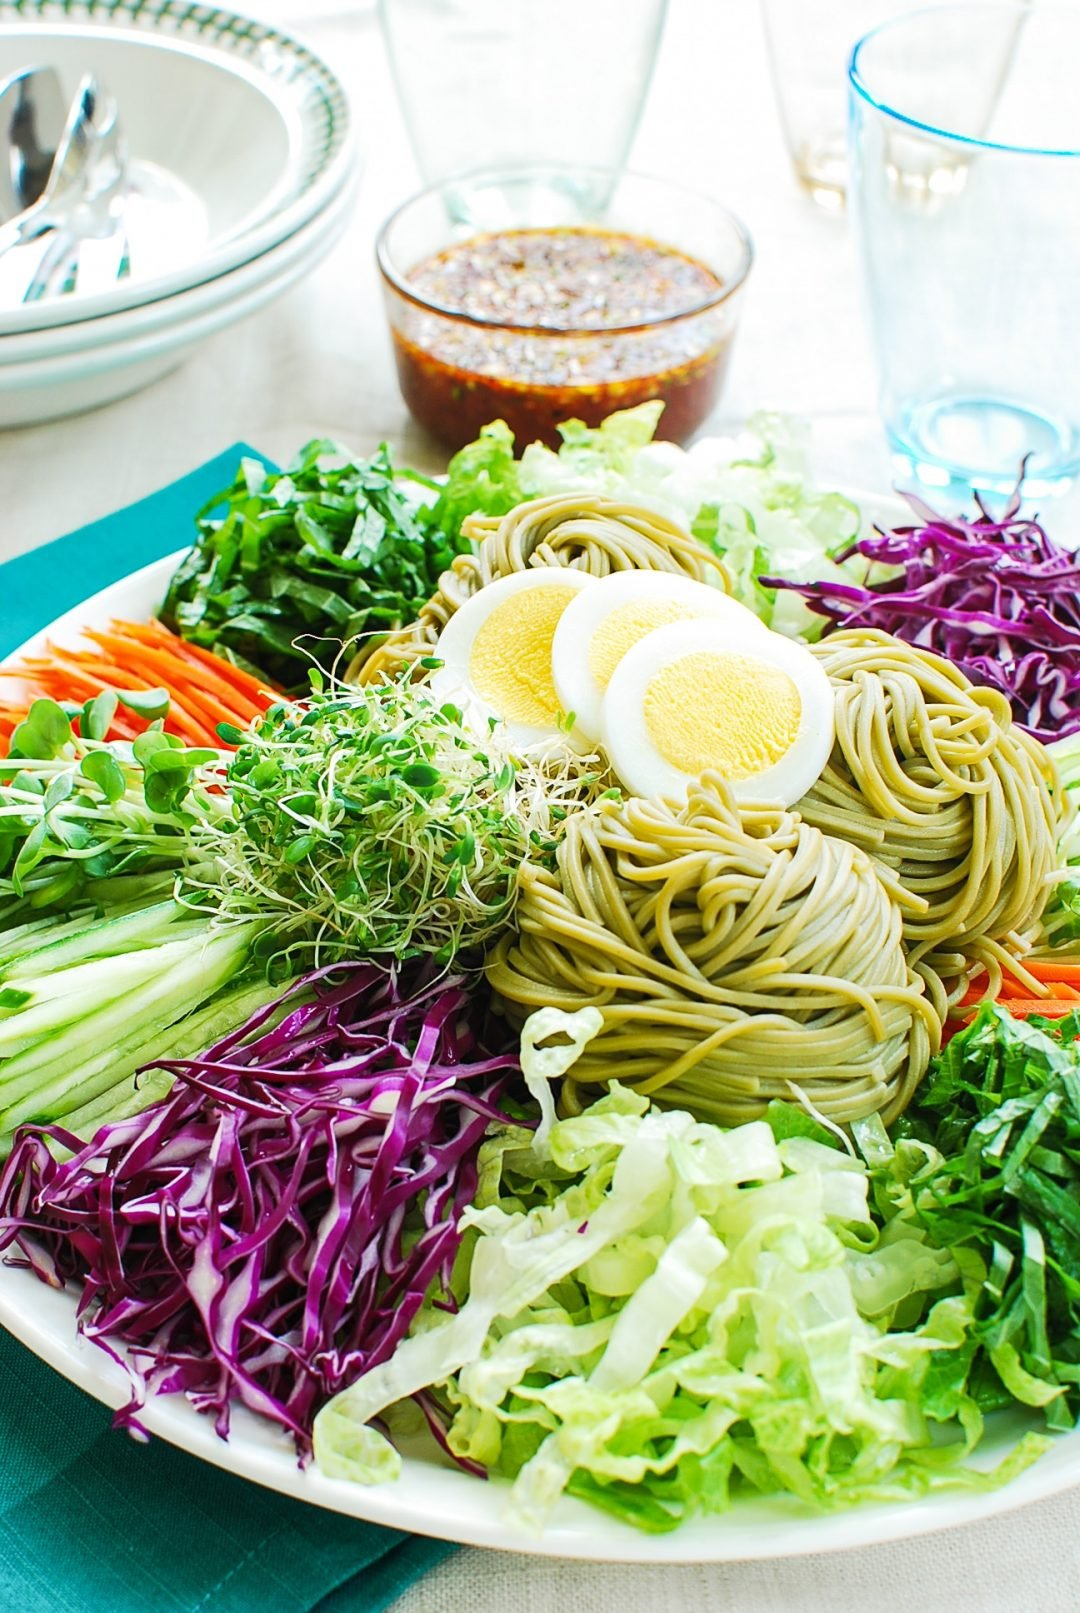 DSC 0632 e1621008477763 - Jaengban Guksu (Cold Noodles and Vegetables)